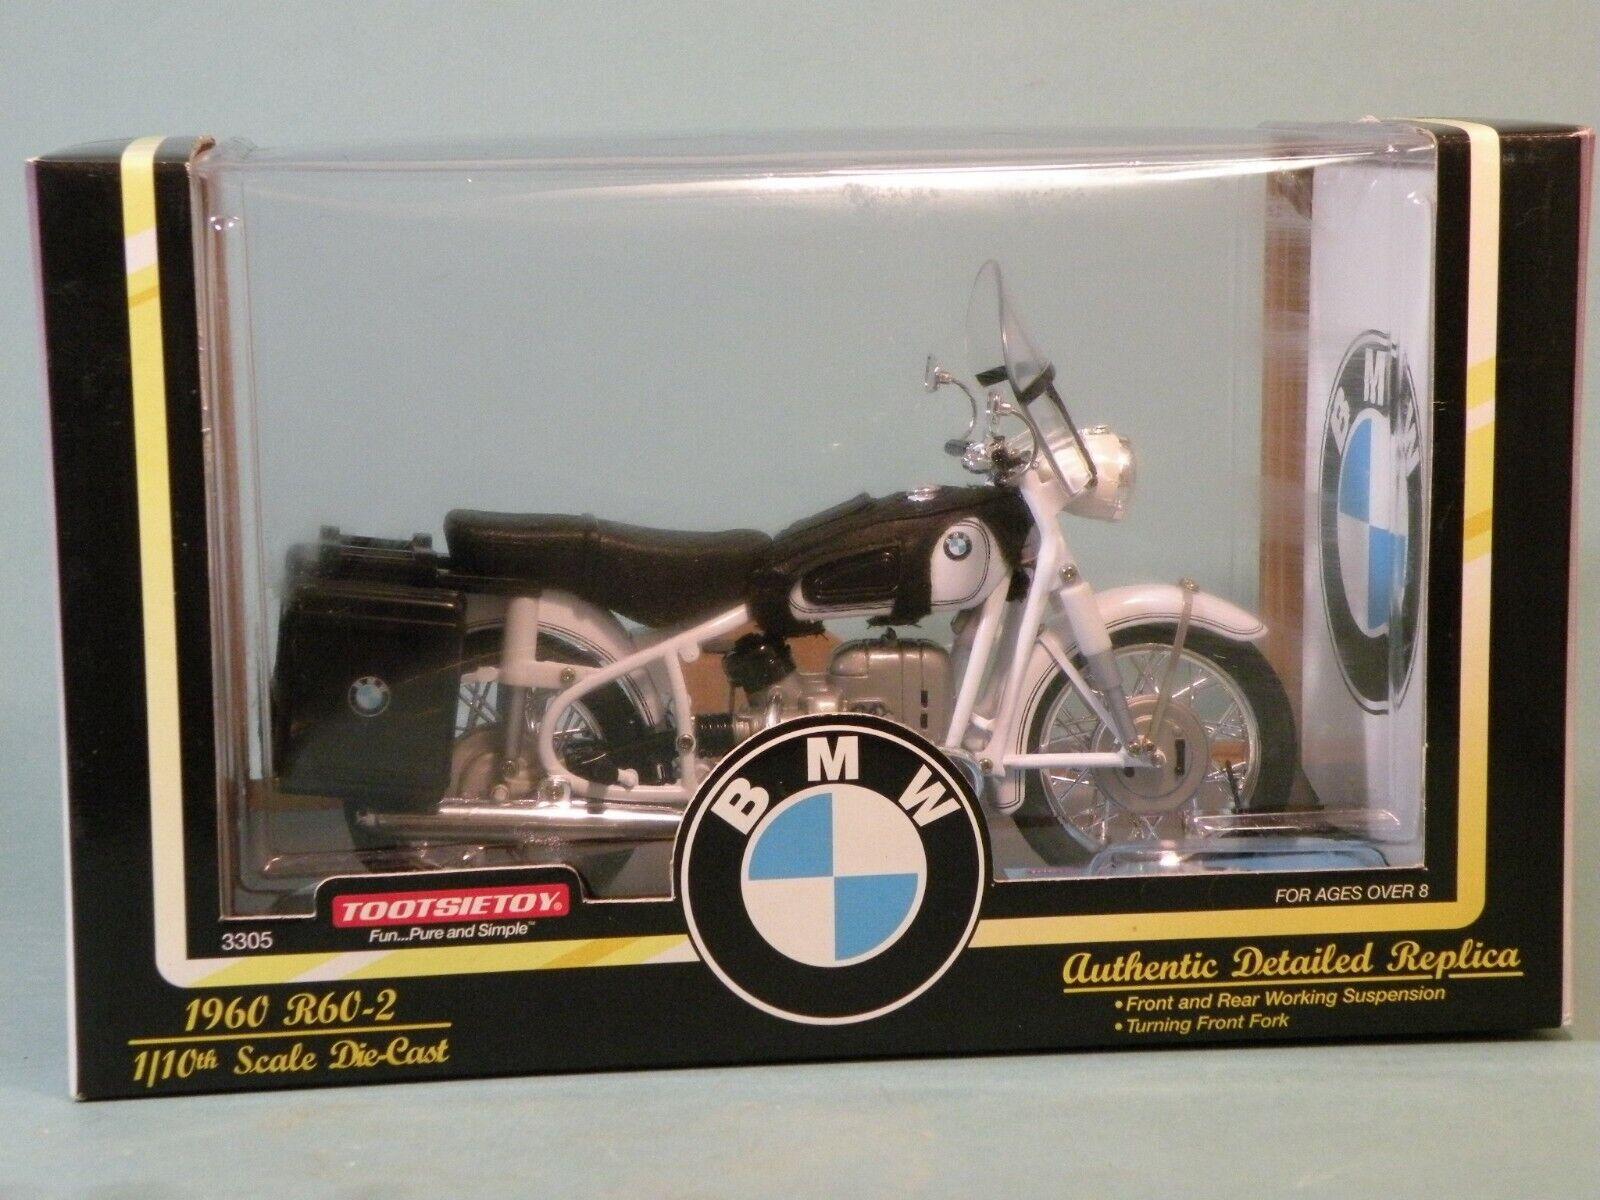 BMW R60 2 1960, 1 10 scale Tootsietoy, Die-Cast In original box. Weiß